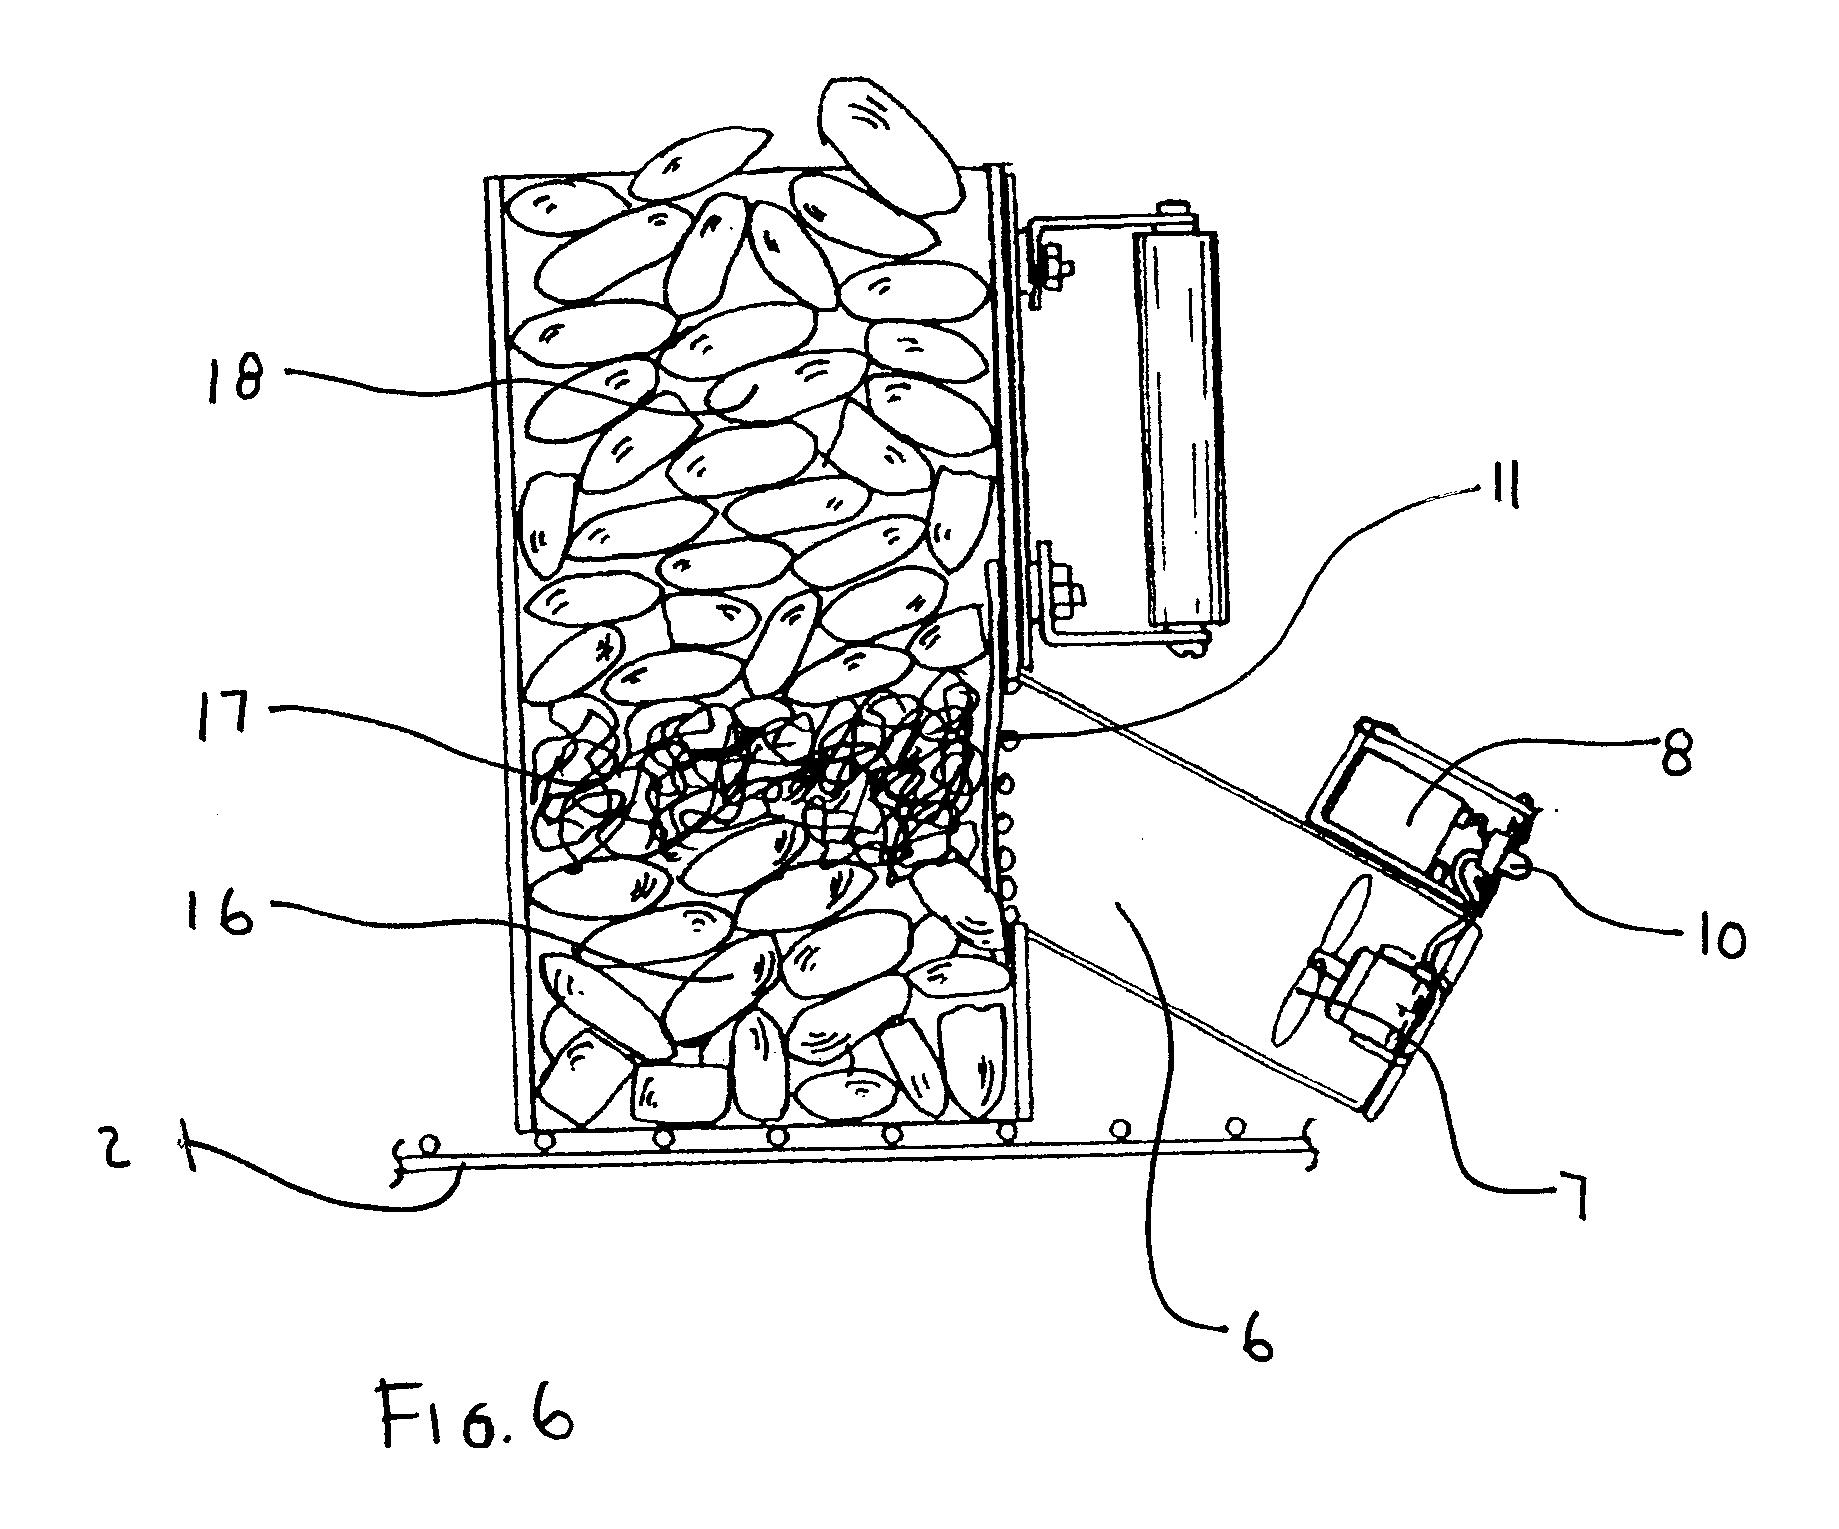 cj7 painless wiring harness diagram cj7 wiring switches